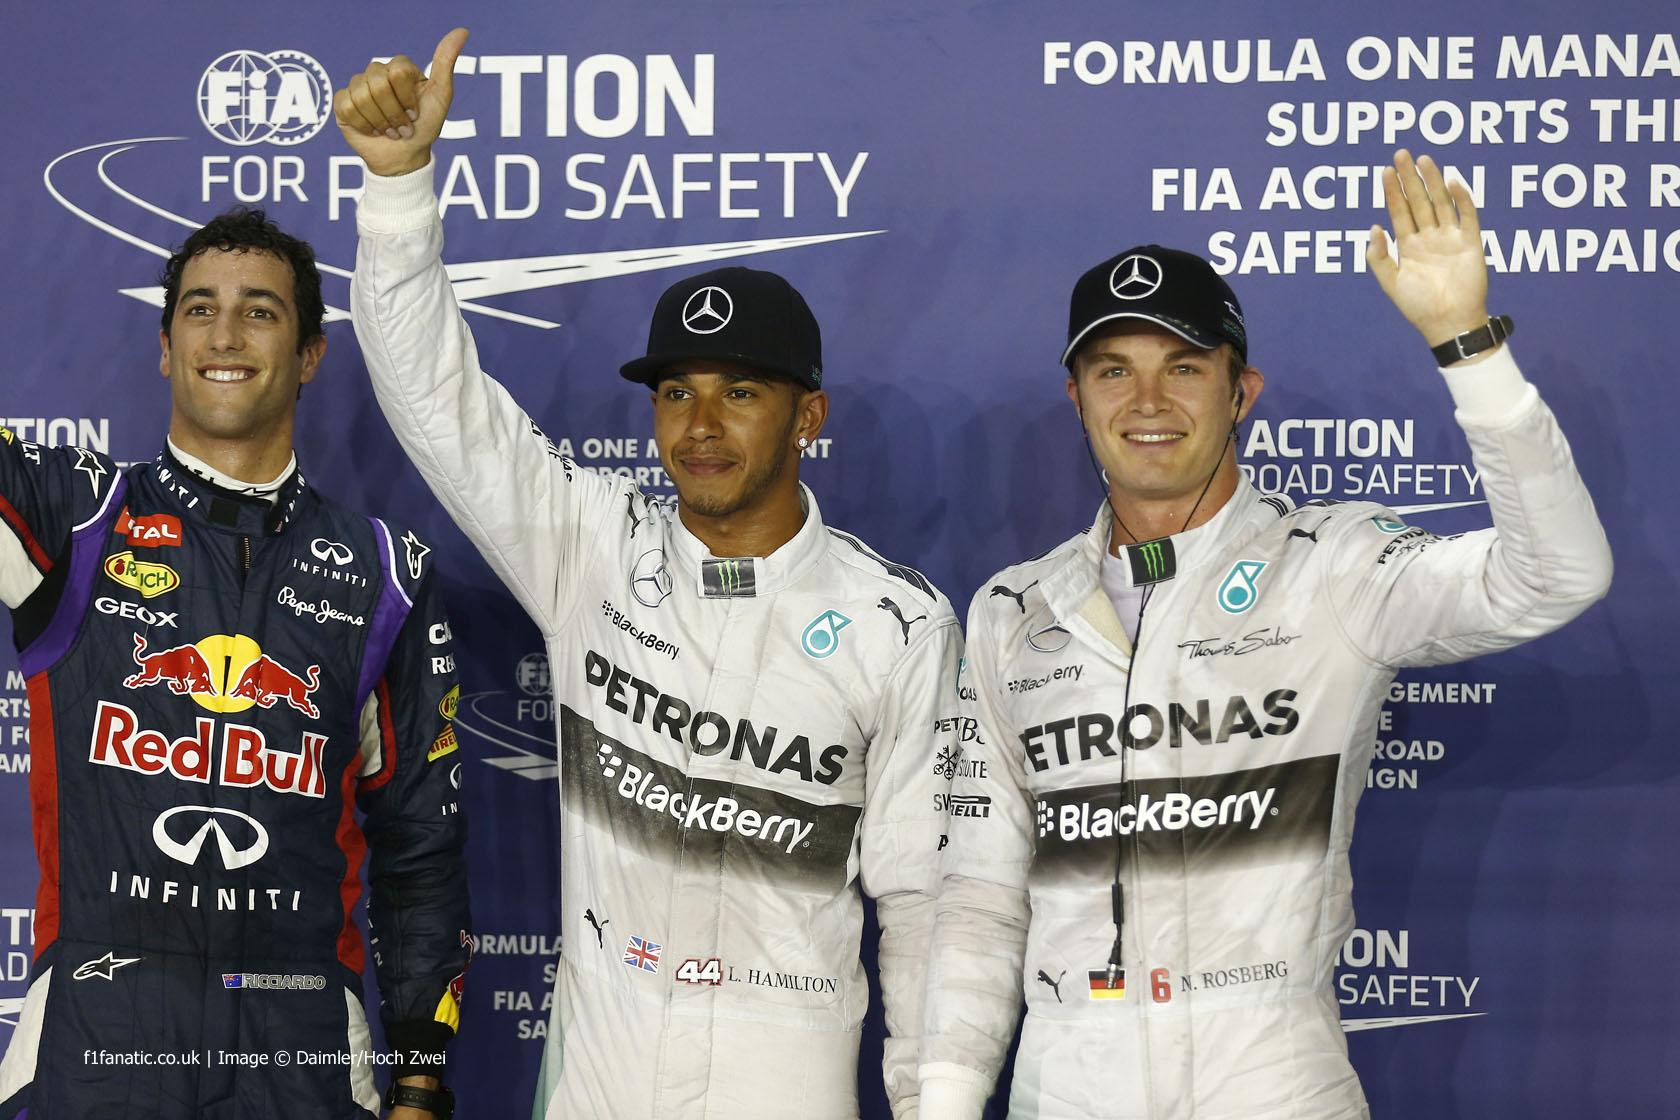 Daniel Ricciardo, Lewis Hamilton, Nico Rosberg, Singapore, 2014